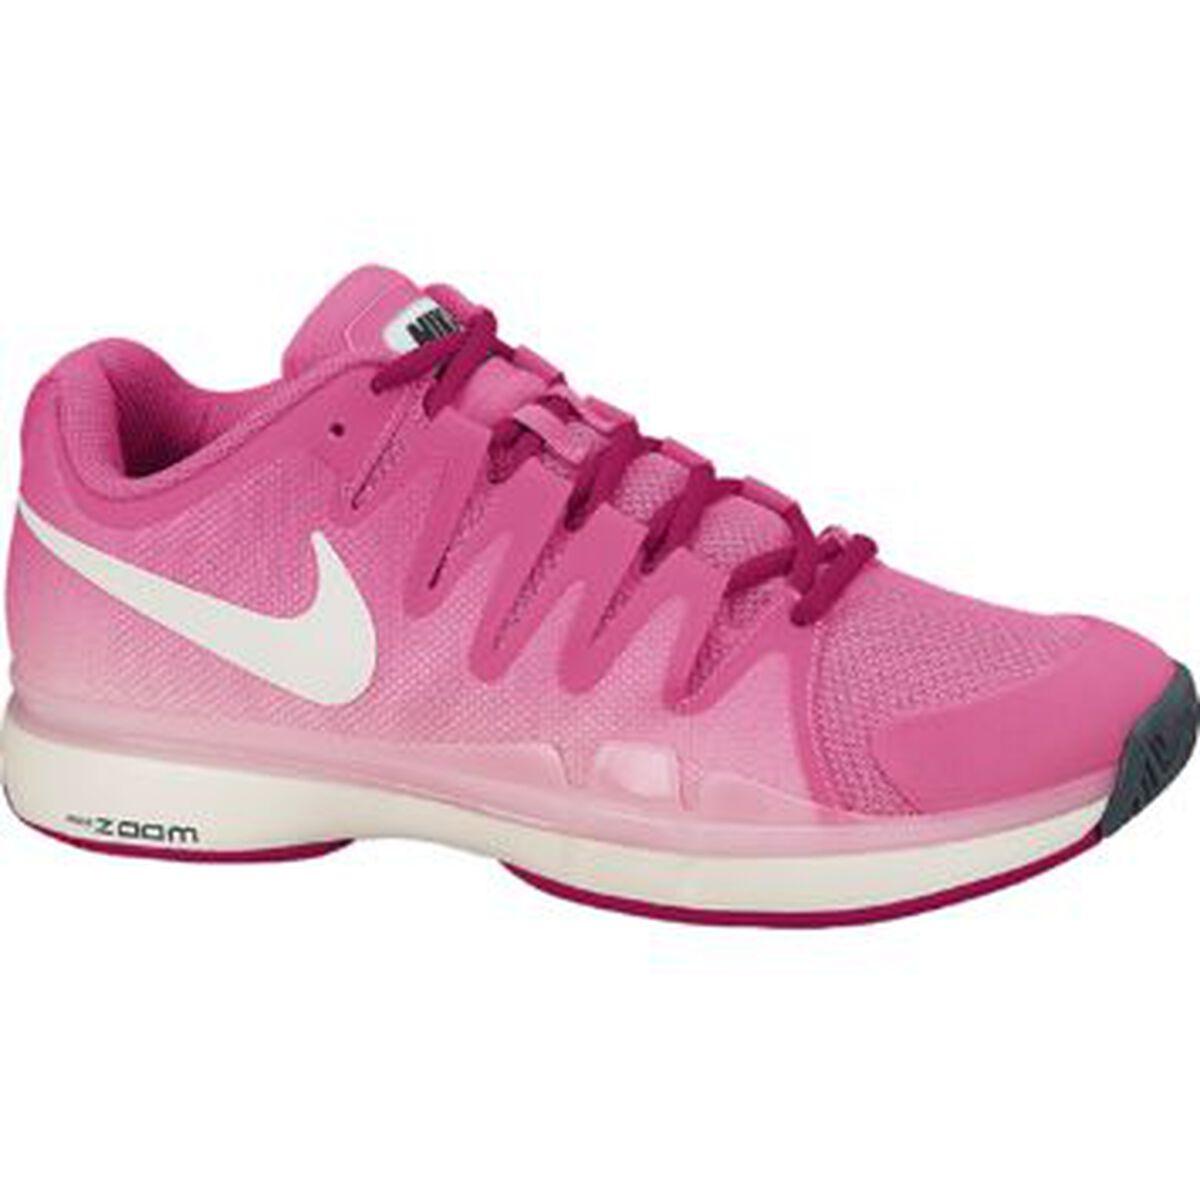 3ade112752e3 NIke Zoom Vapor 9.5 Tour Women s Tennis Shoe - Hyper Pink